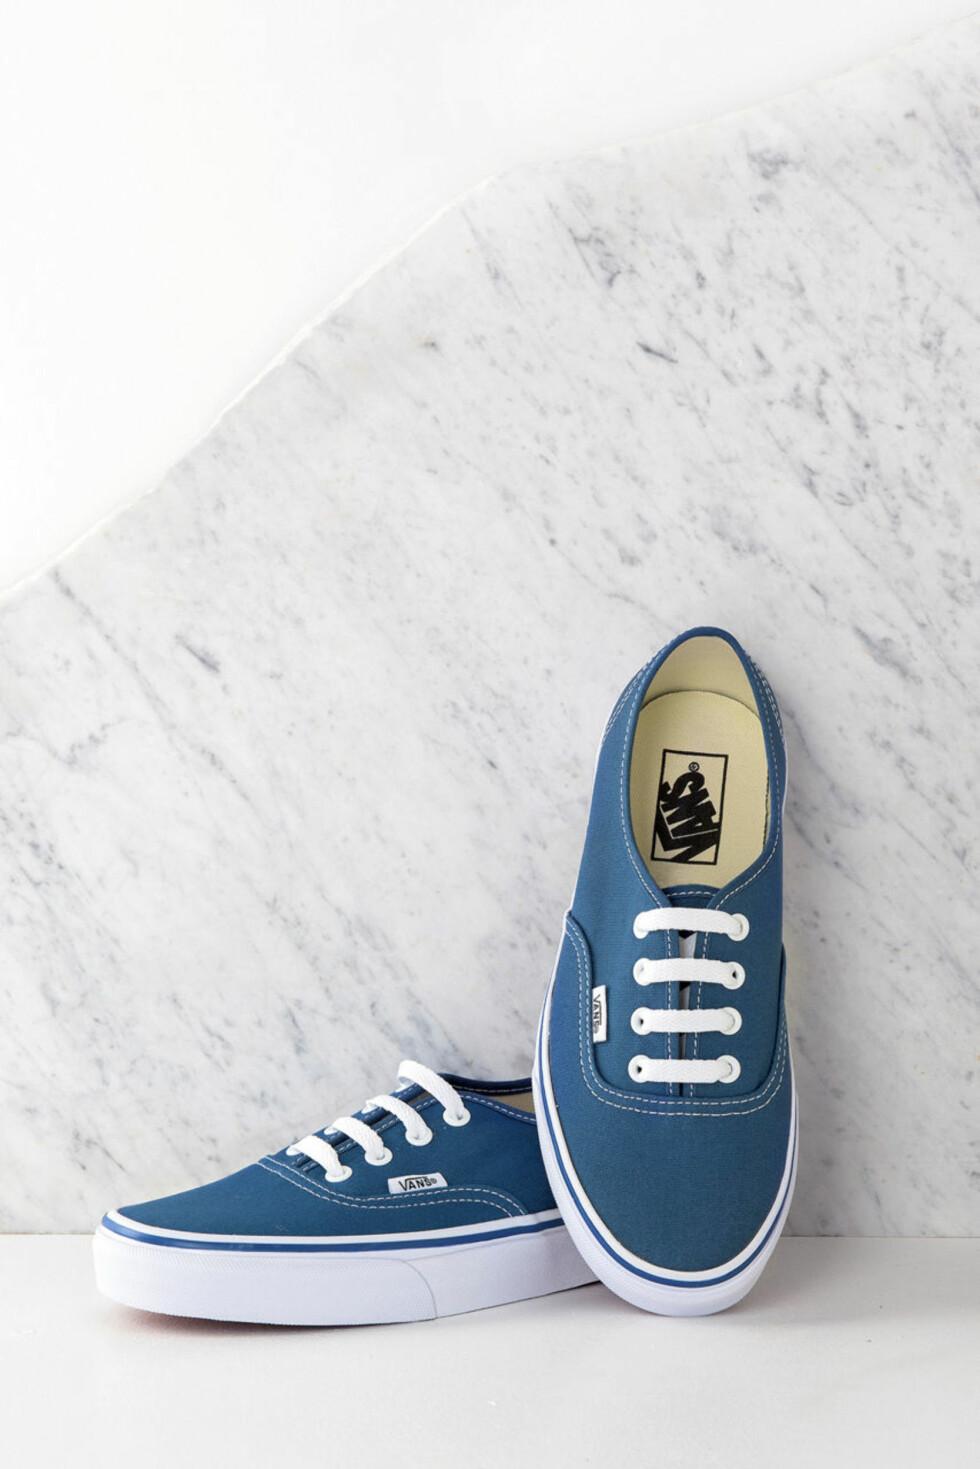 Blå sko i modellen Old Skool fra   Vans   http://apprl.com/en/pd/4Nx2/